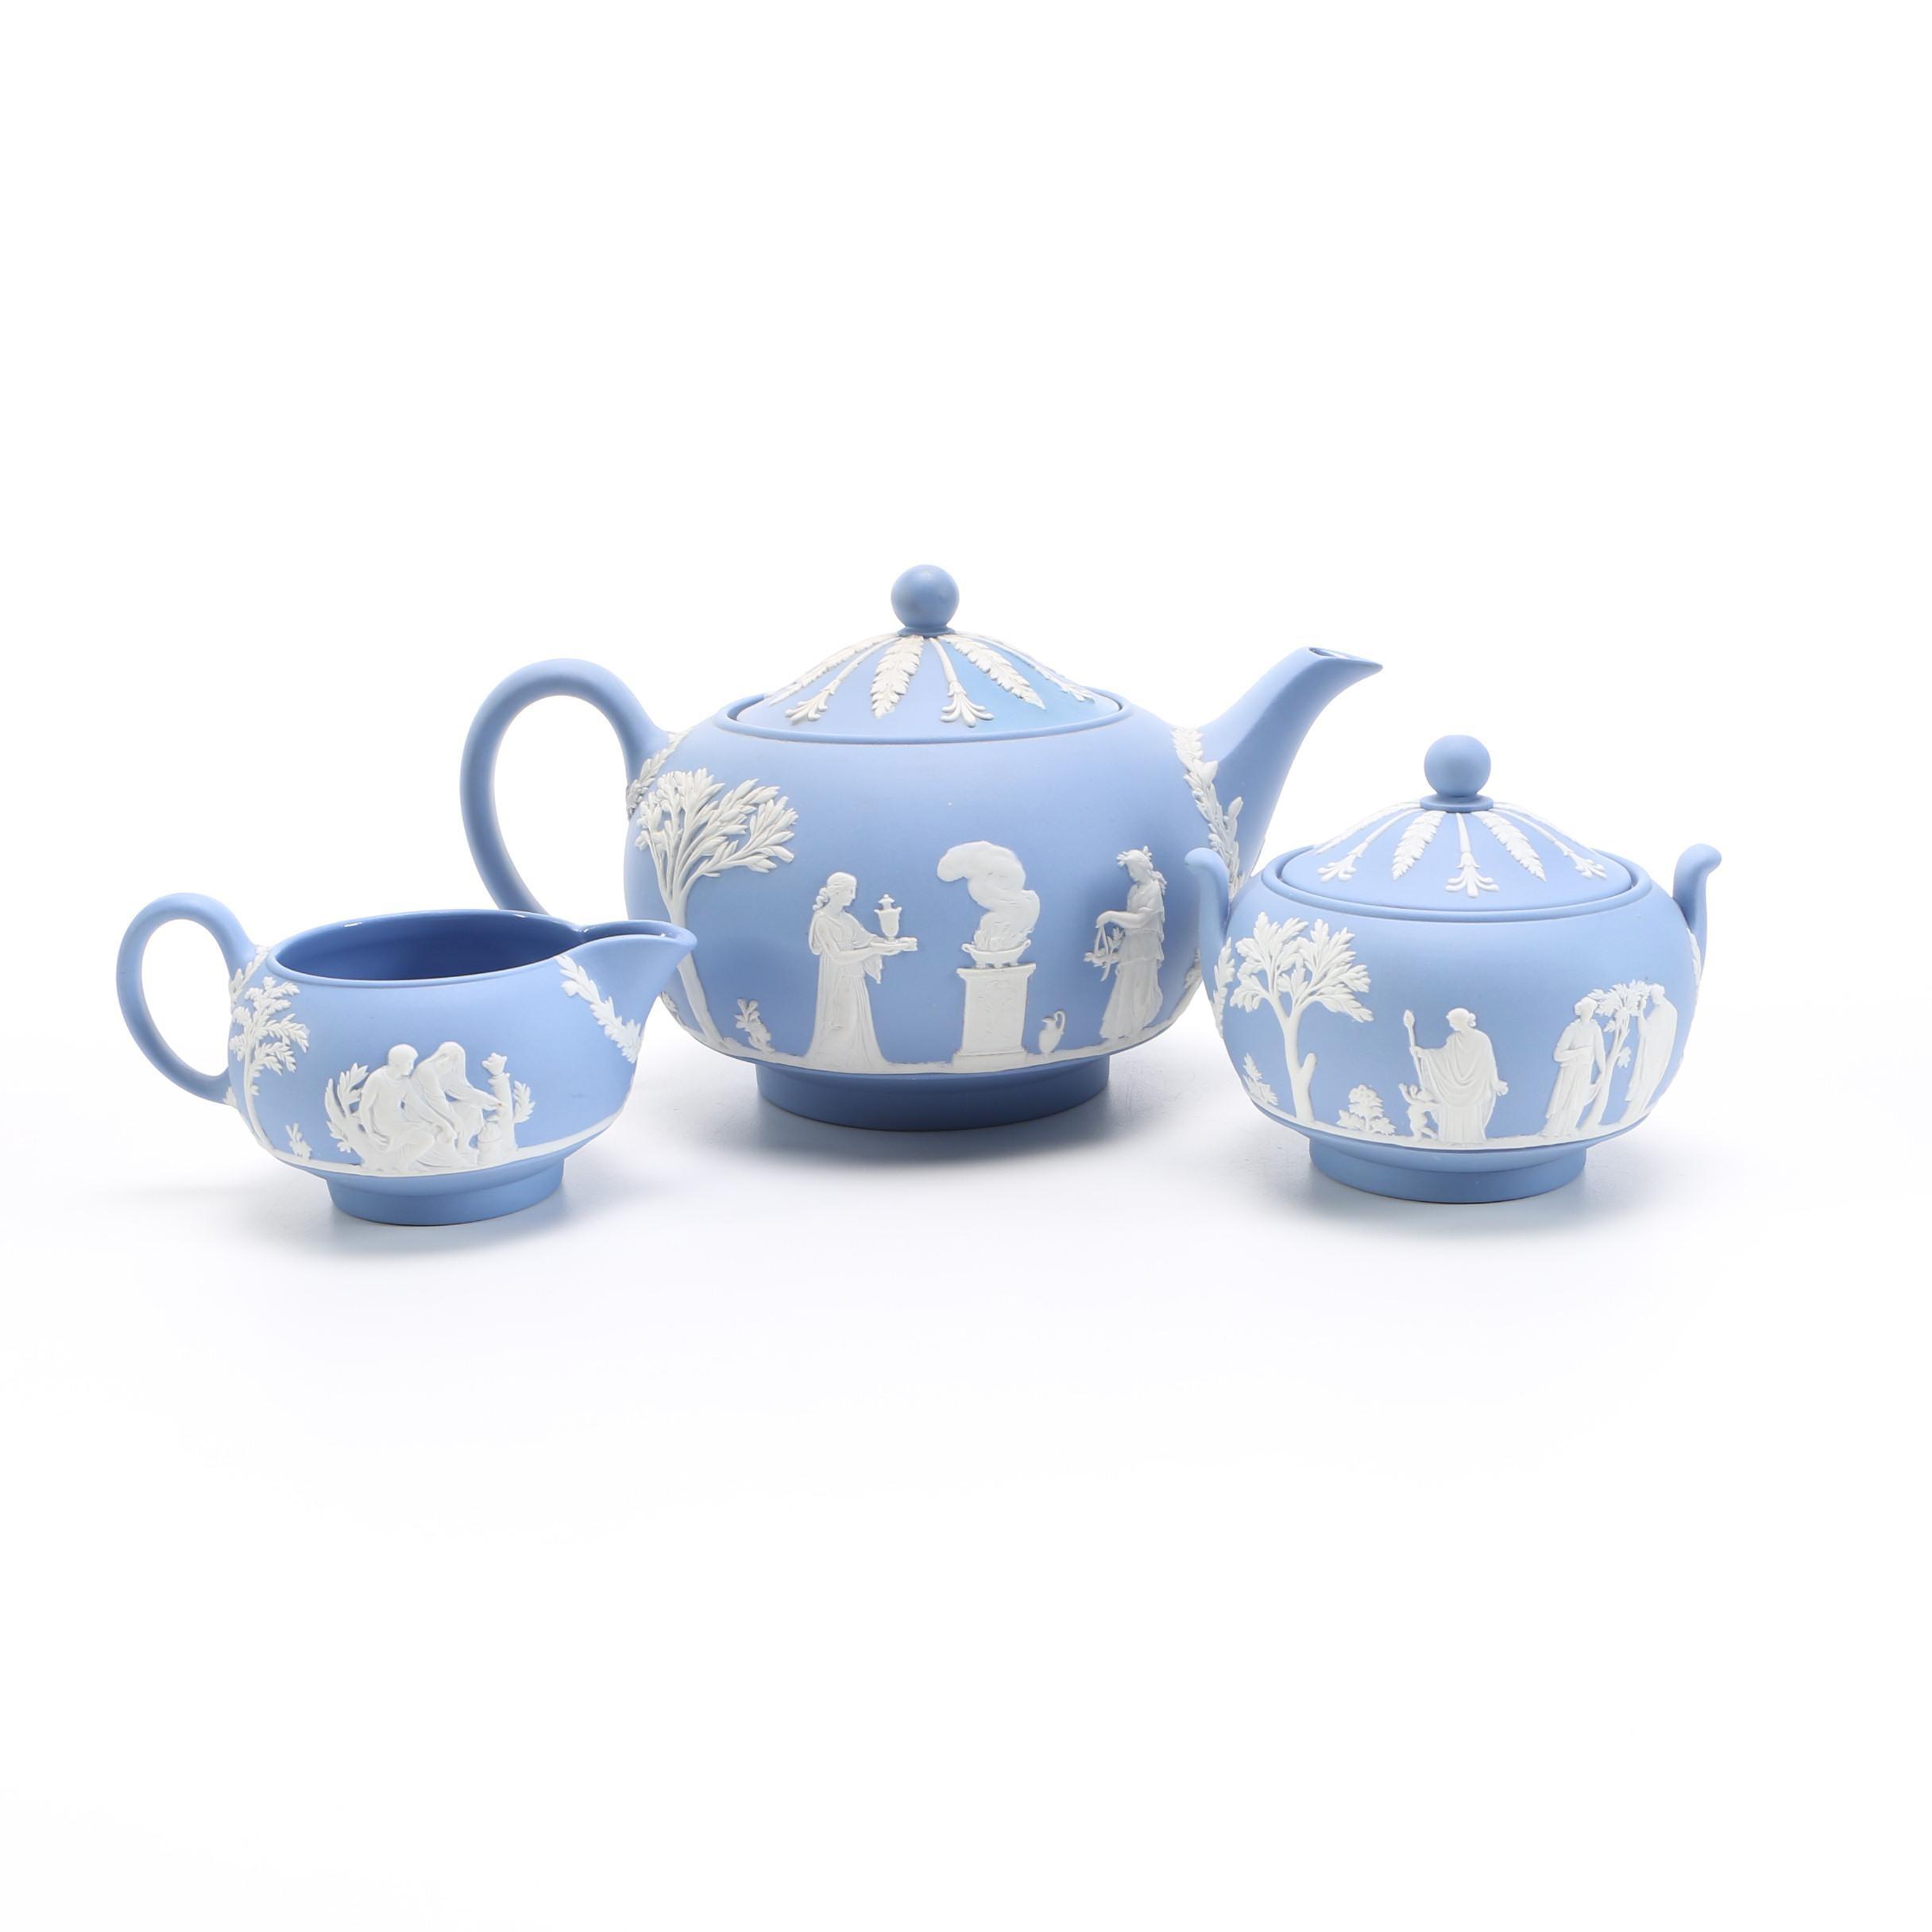 Wedgwood Blue Jasperware Tea Service